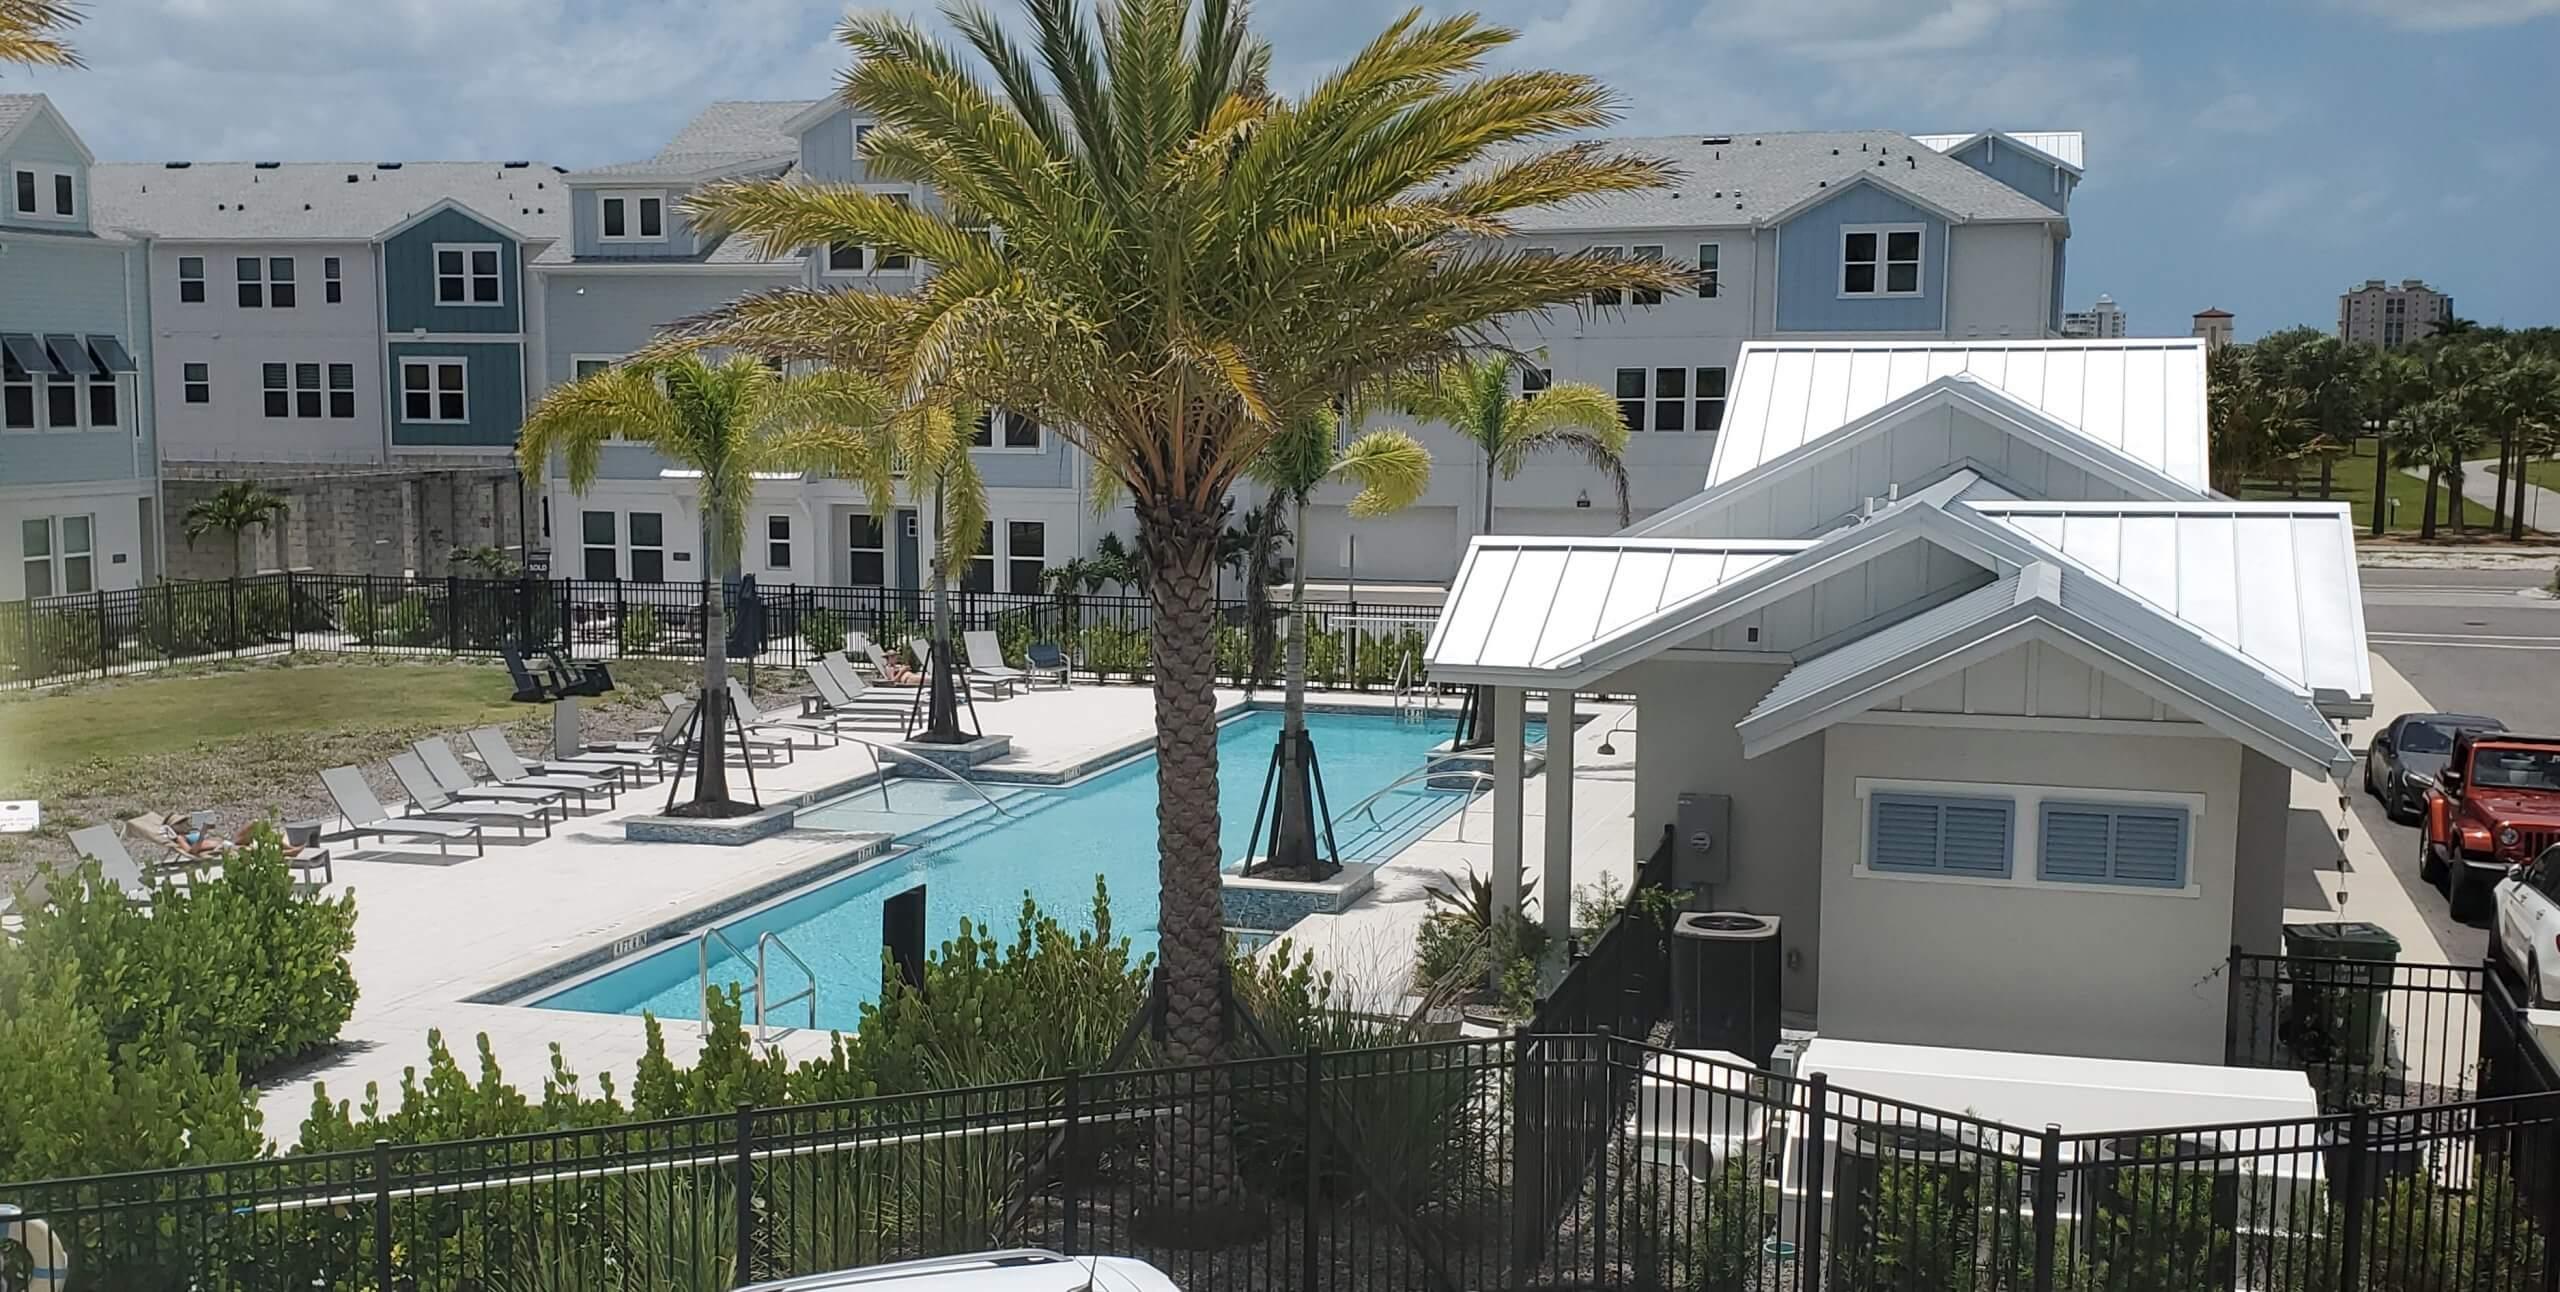 Pyne Park Pool